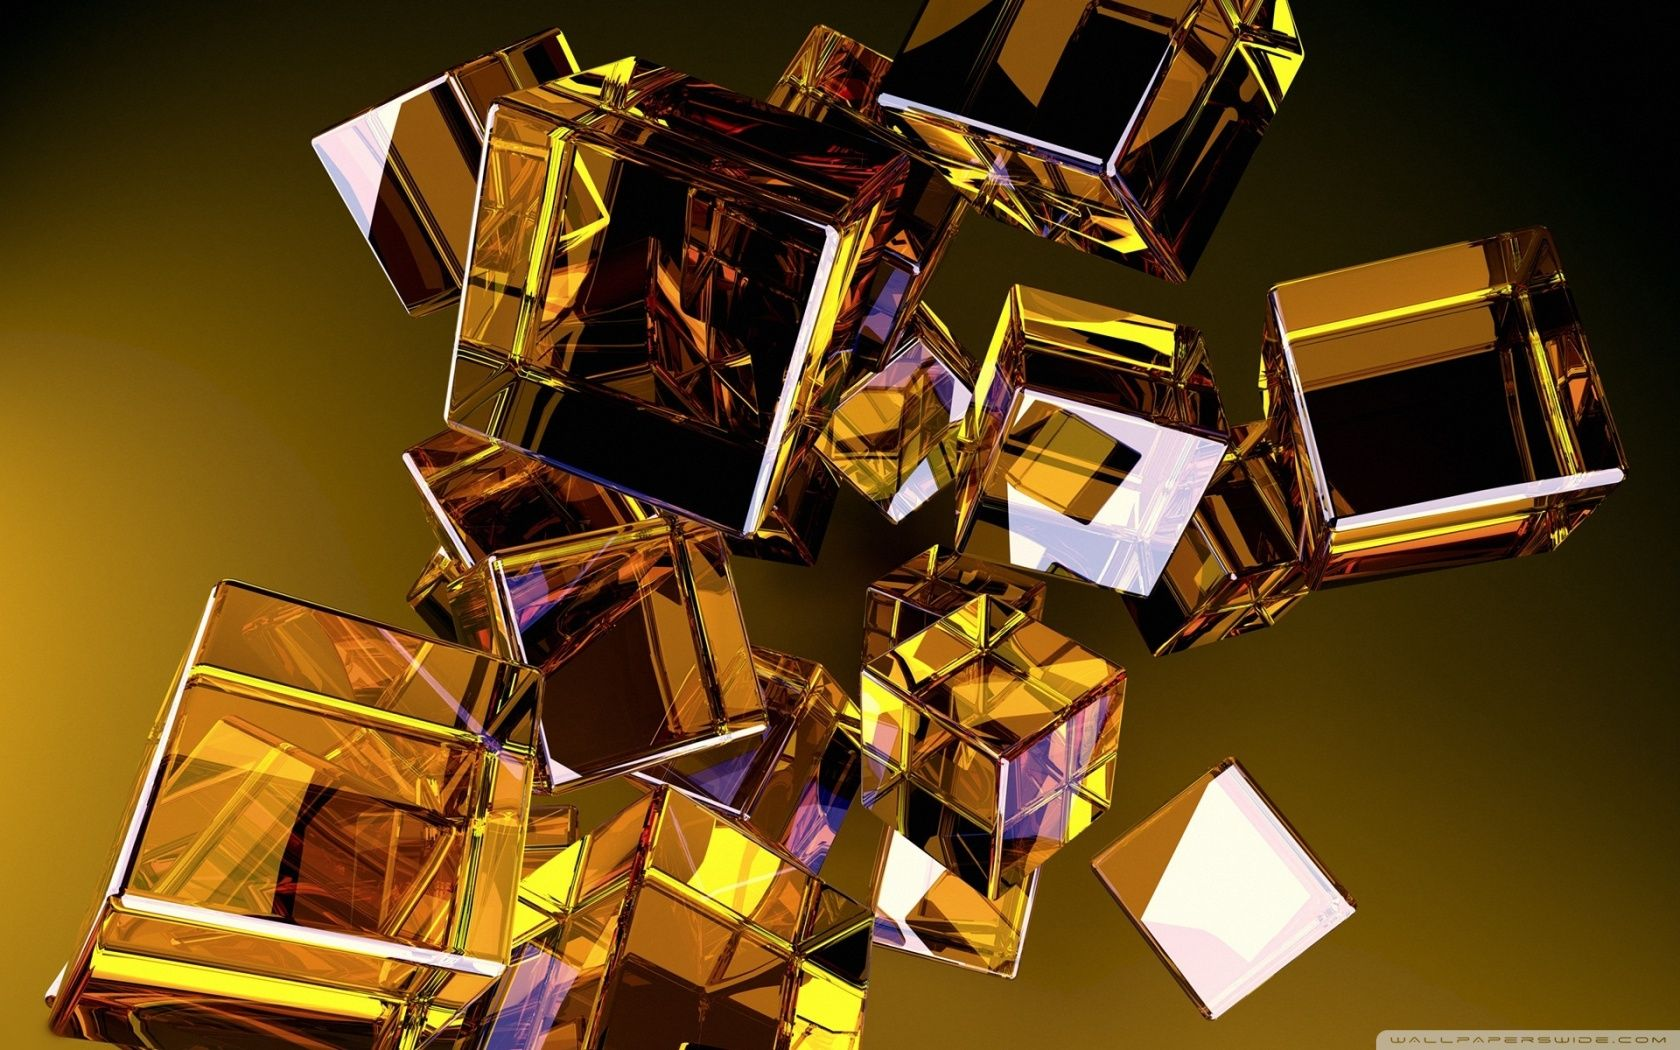 fond ecran hd cube verre abstrait